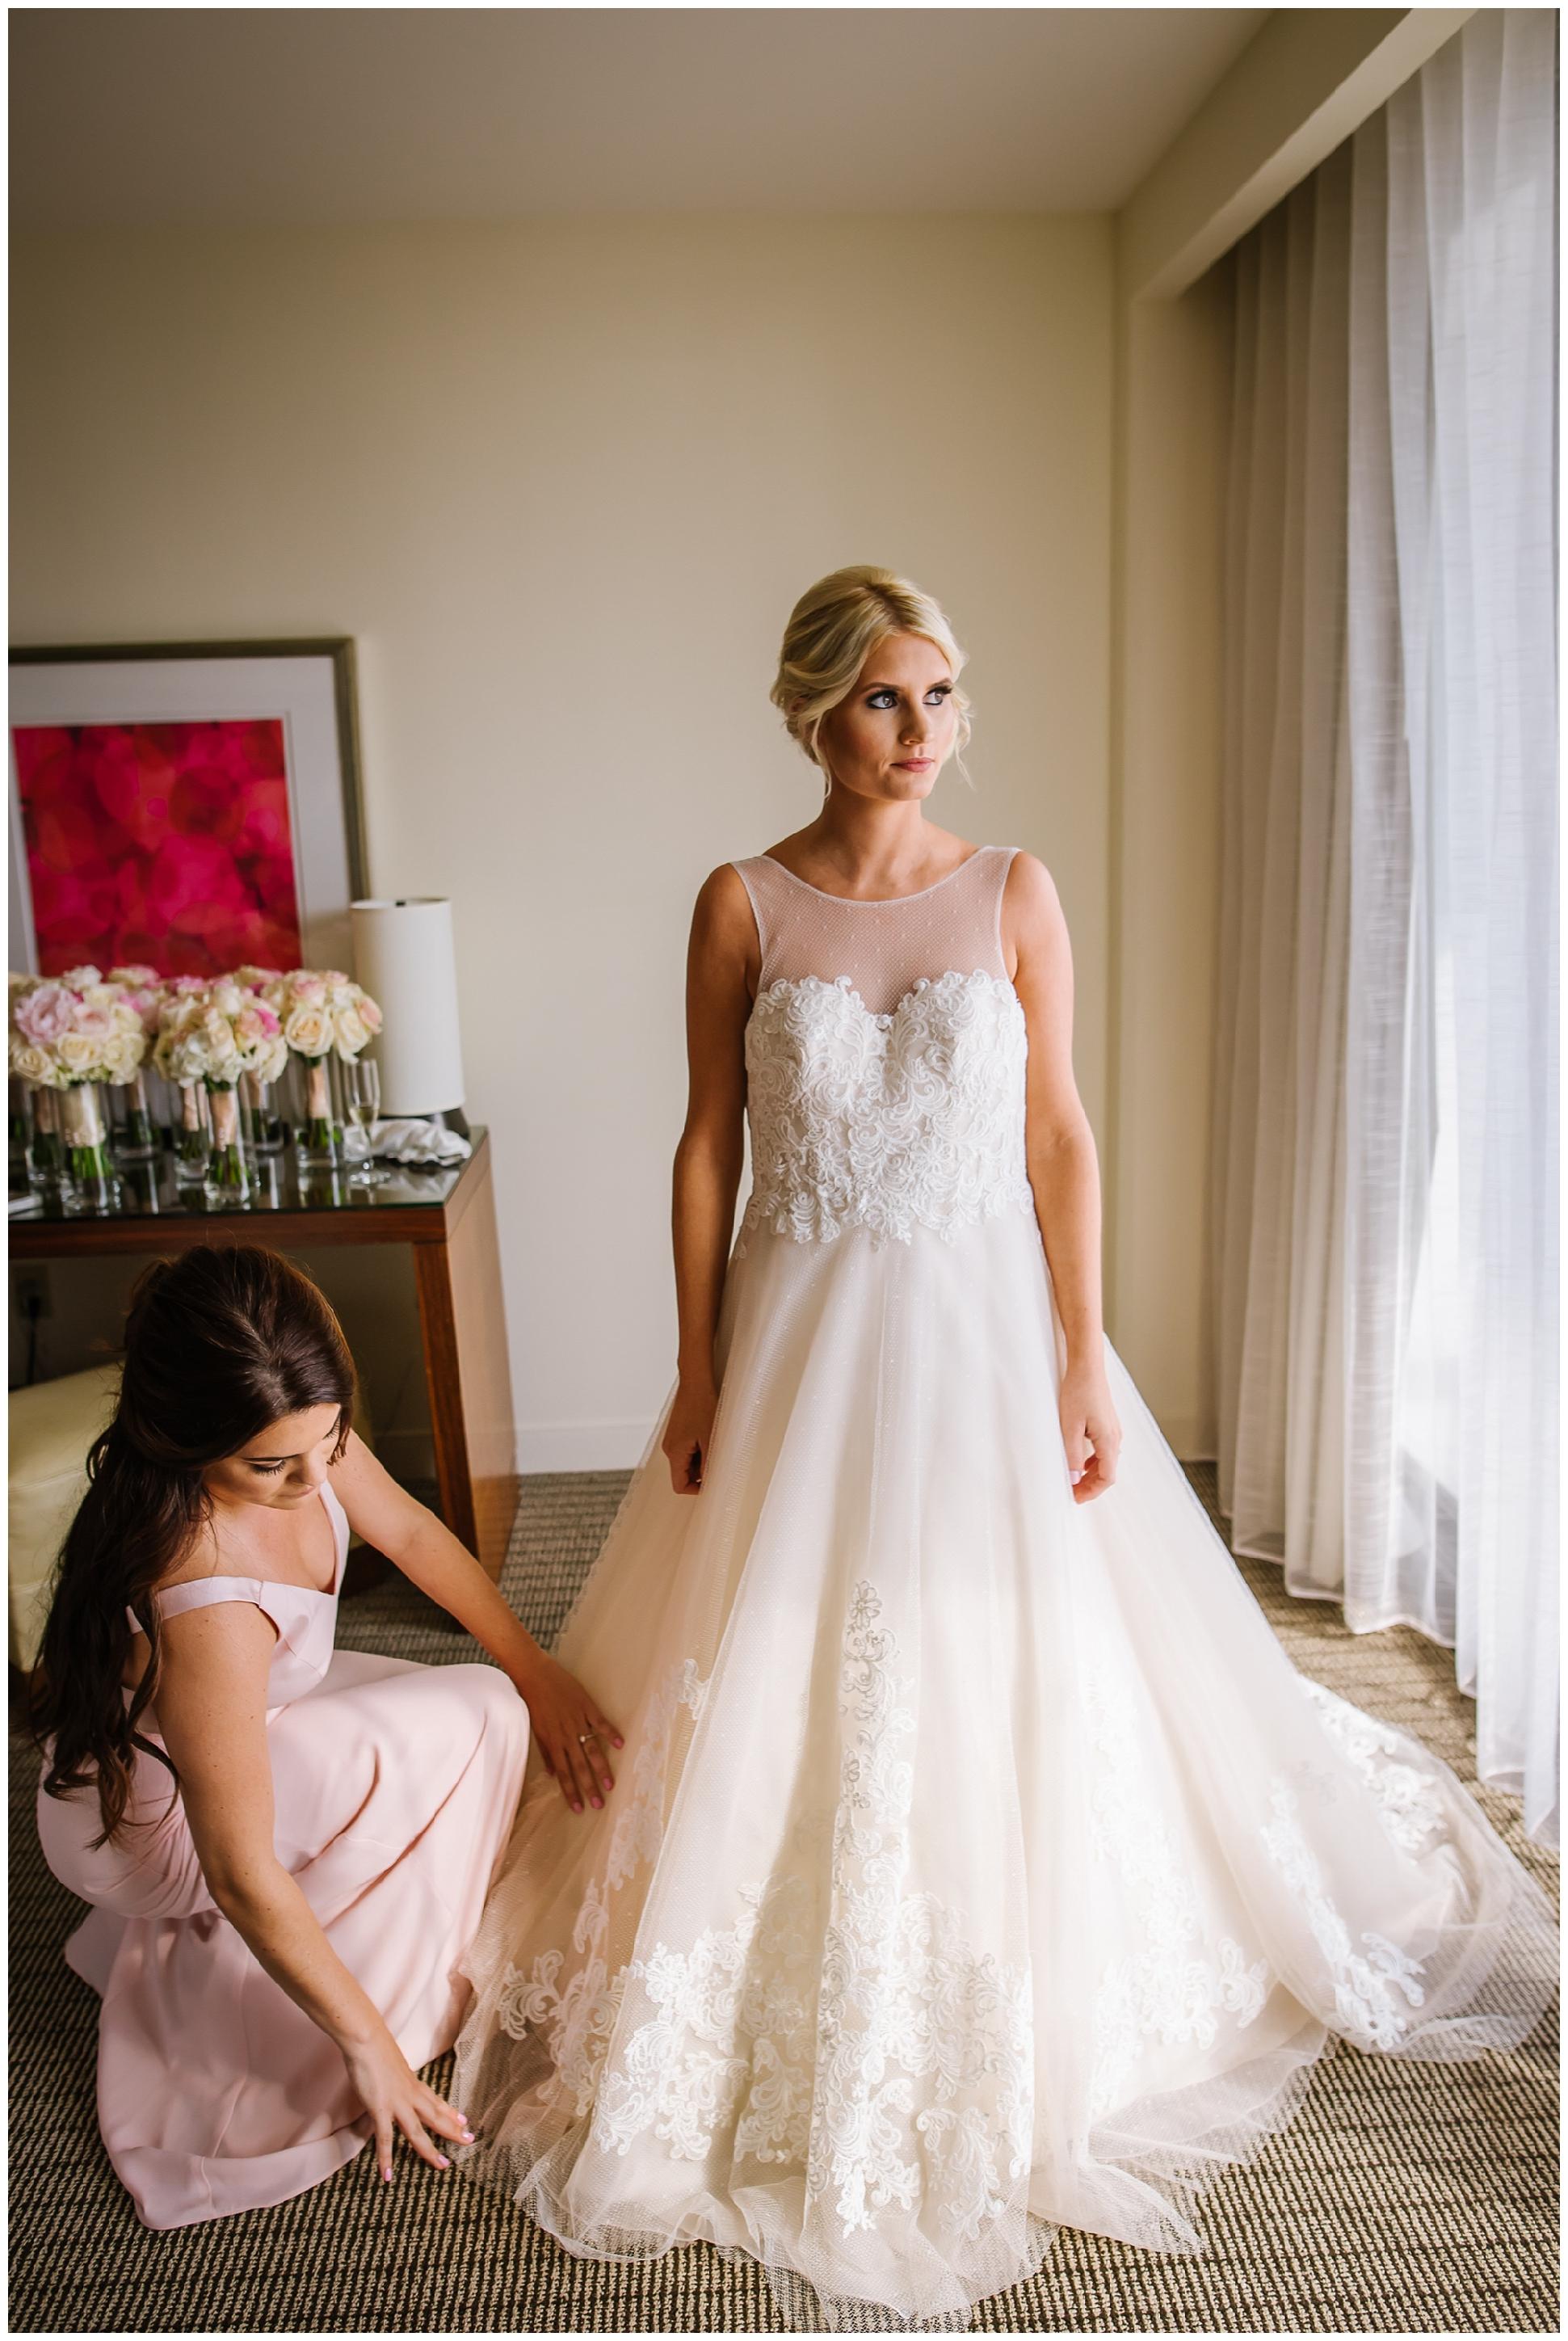 Sarasota-wedding-photographer-hyatt-regency-blush_0016.jpg